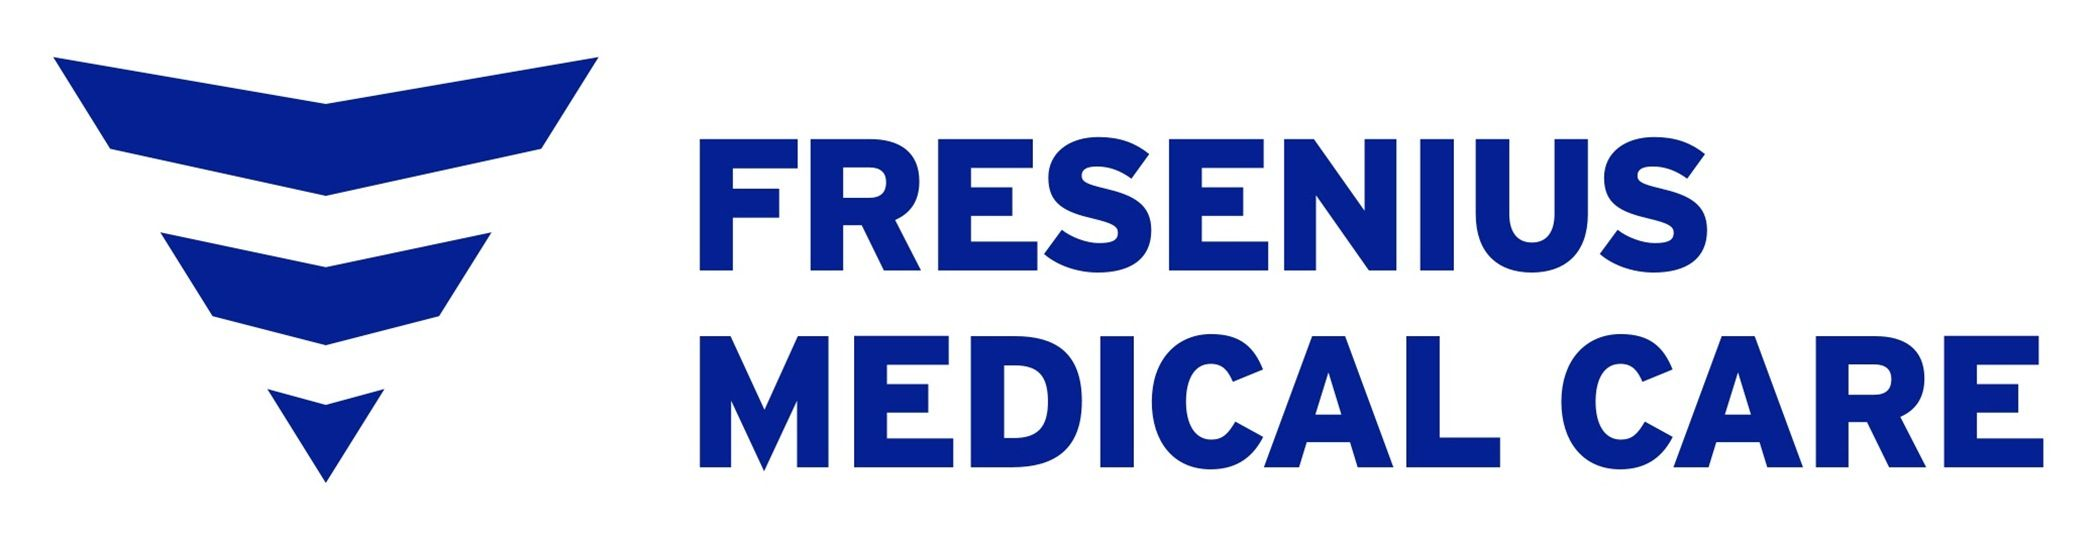 Fresenius Medical Care North America (FMCNA) is hiring